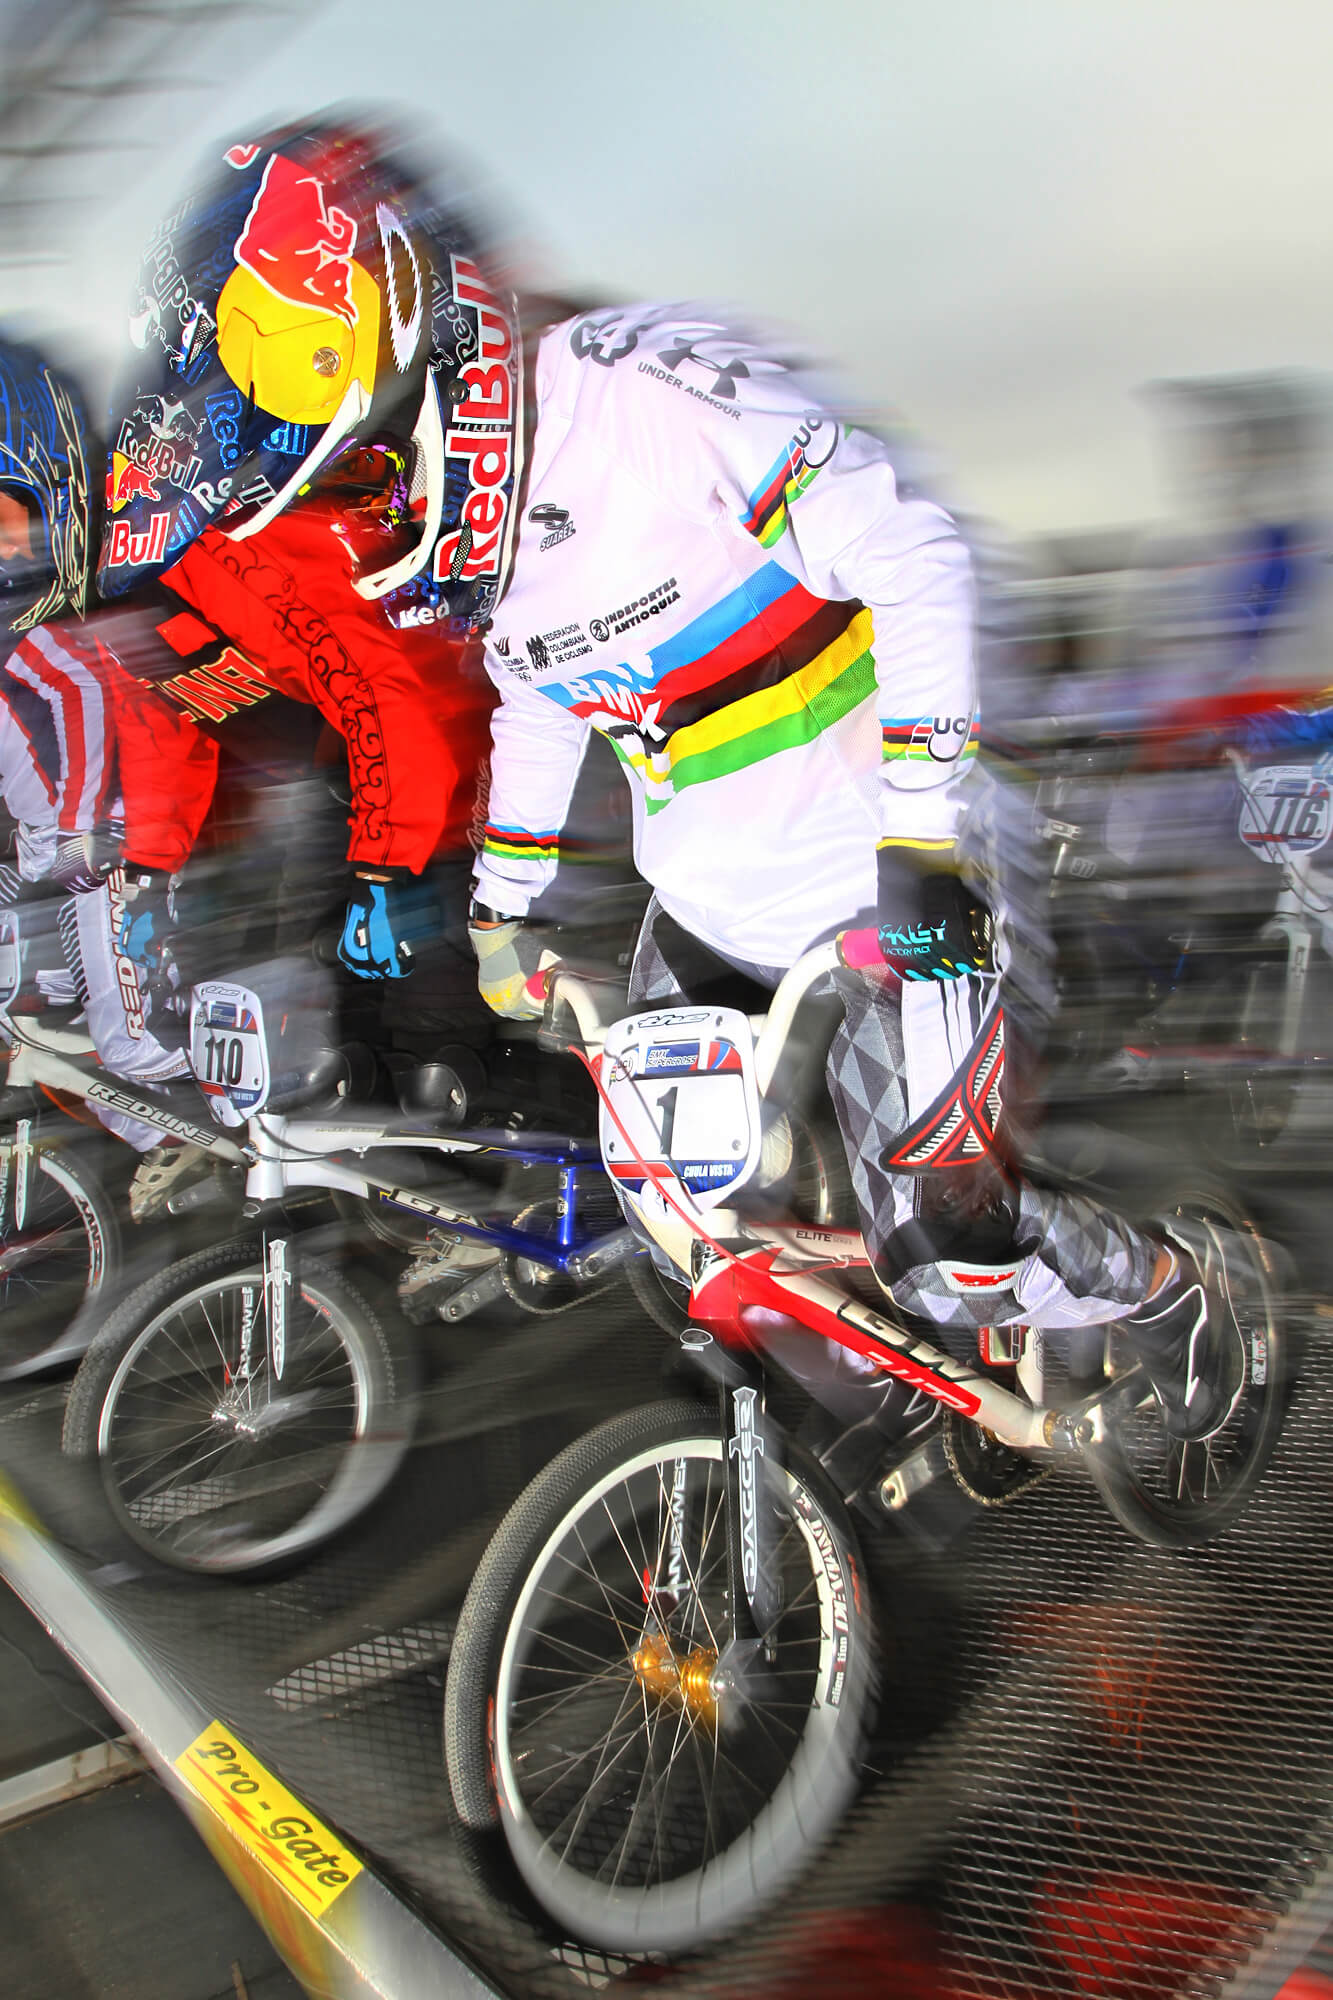 2012 UCI World Cup in Chula Vista Mariana Pajon - Jerry Landrum